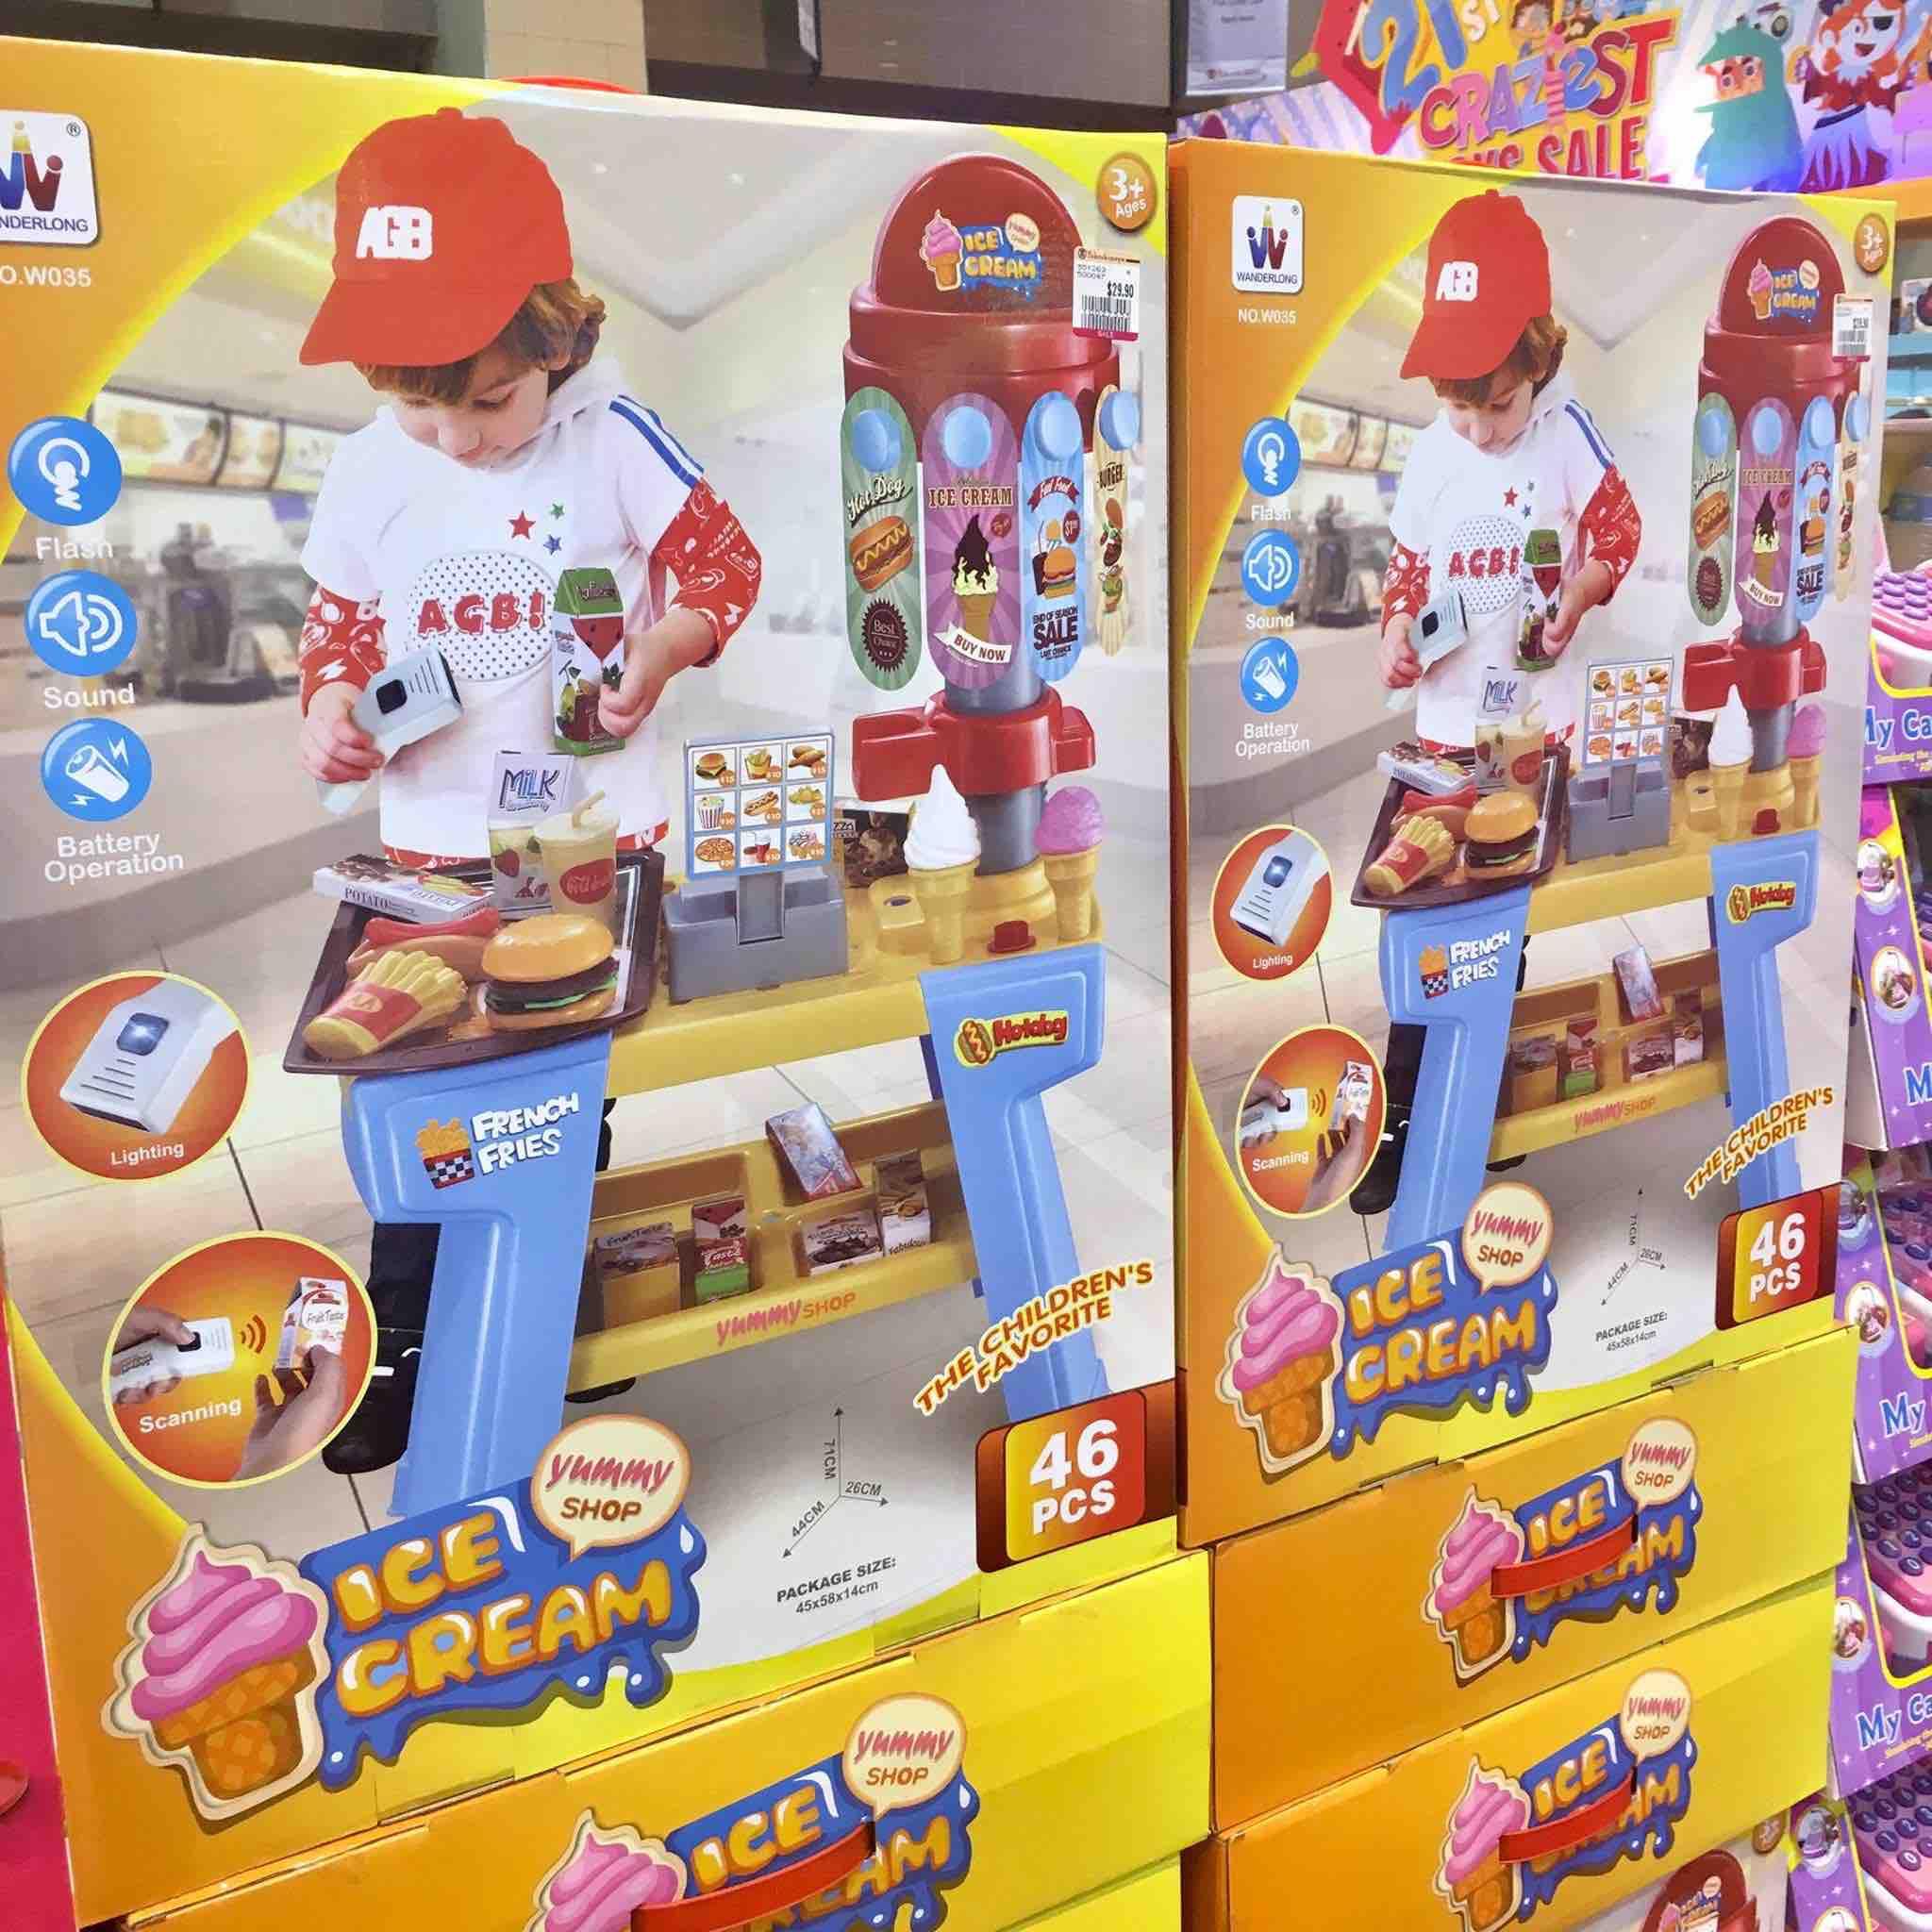 Takashimaya Singapore 21st Craziest Toys Sale Promotion 28 Jul - 6 Aug 2017   Why Not Deals 18 & Promotions